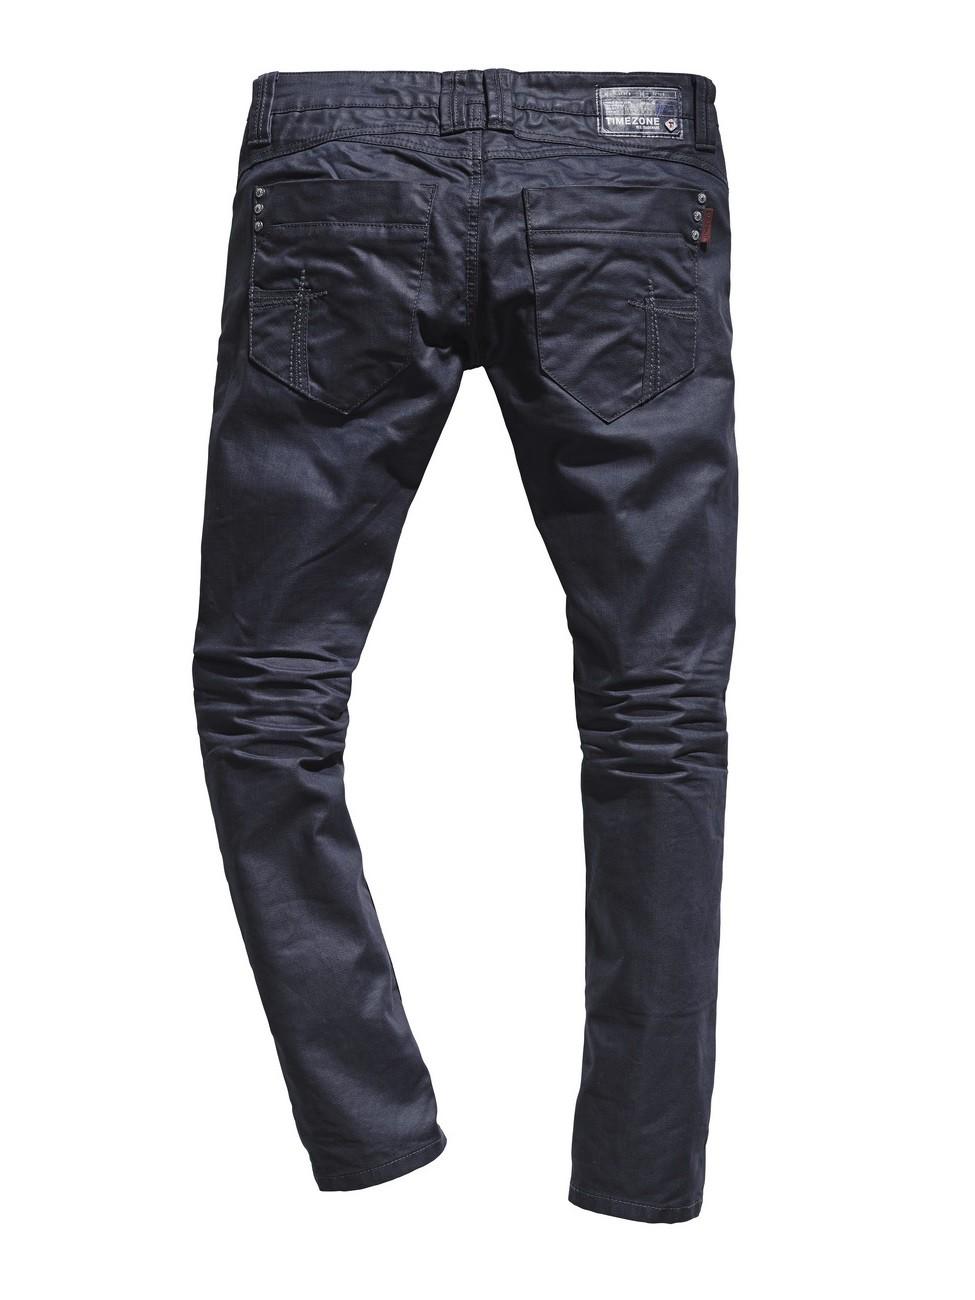 Timezone Herren Jeans TaylorTZ - Slim Fit - Blue Dull Wash